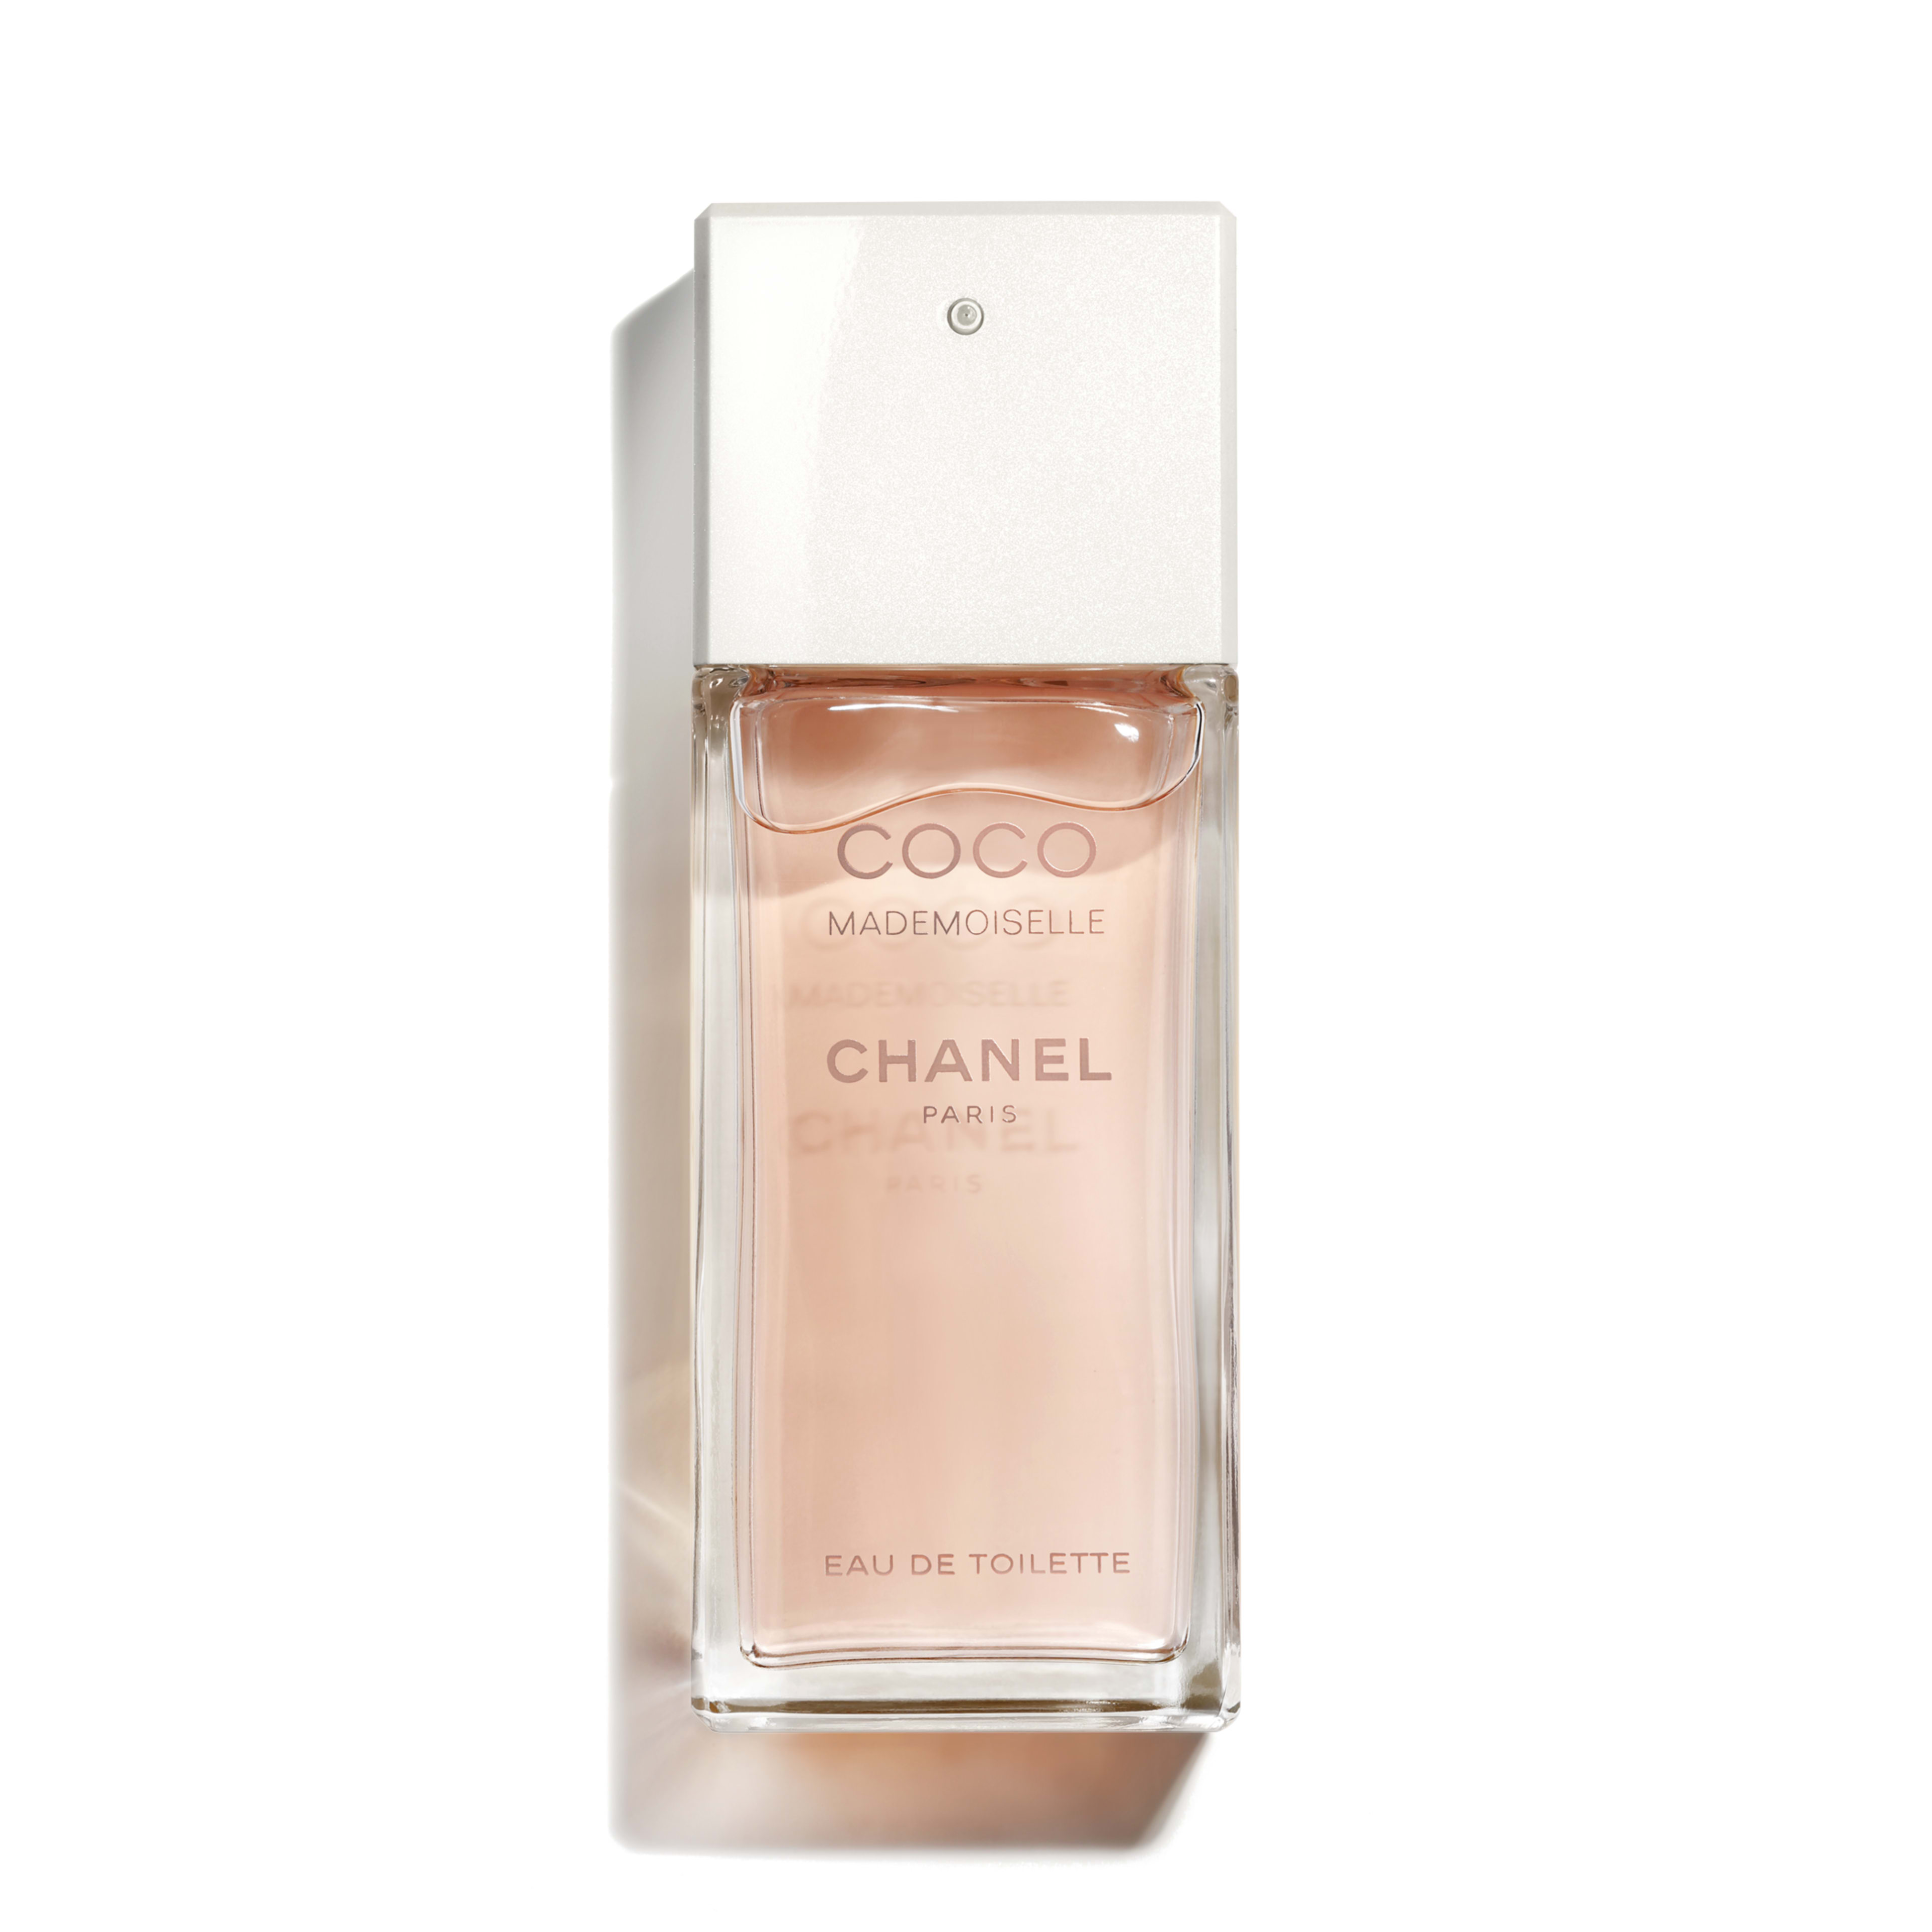 COCO MADEMOISELLE - fragrance - 3.4FL. OZ. - Default view